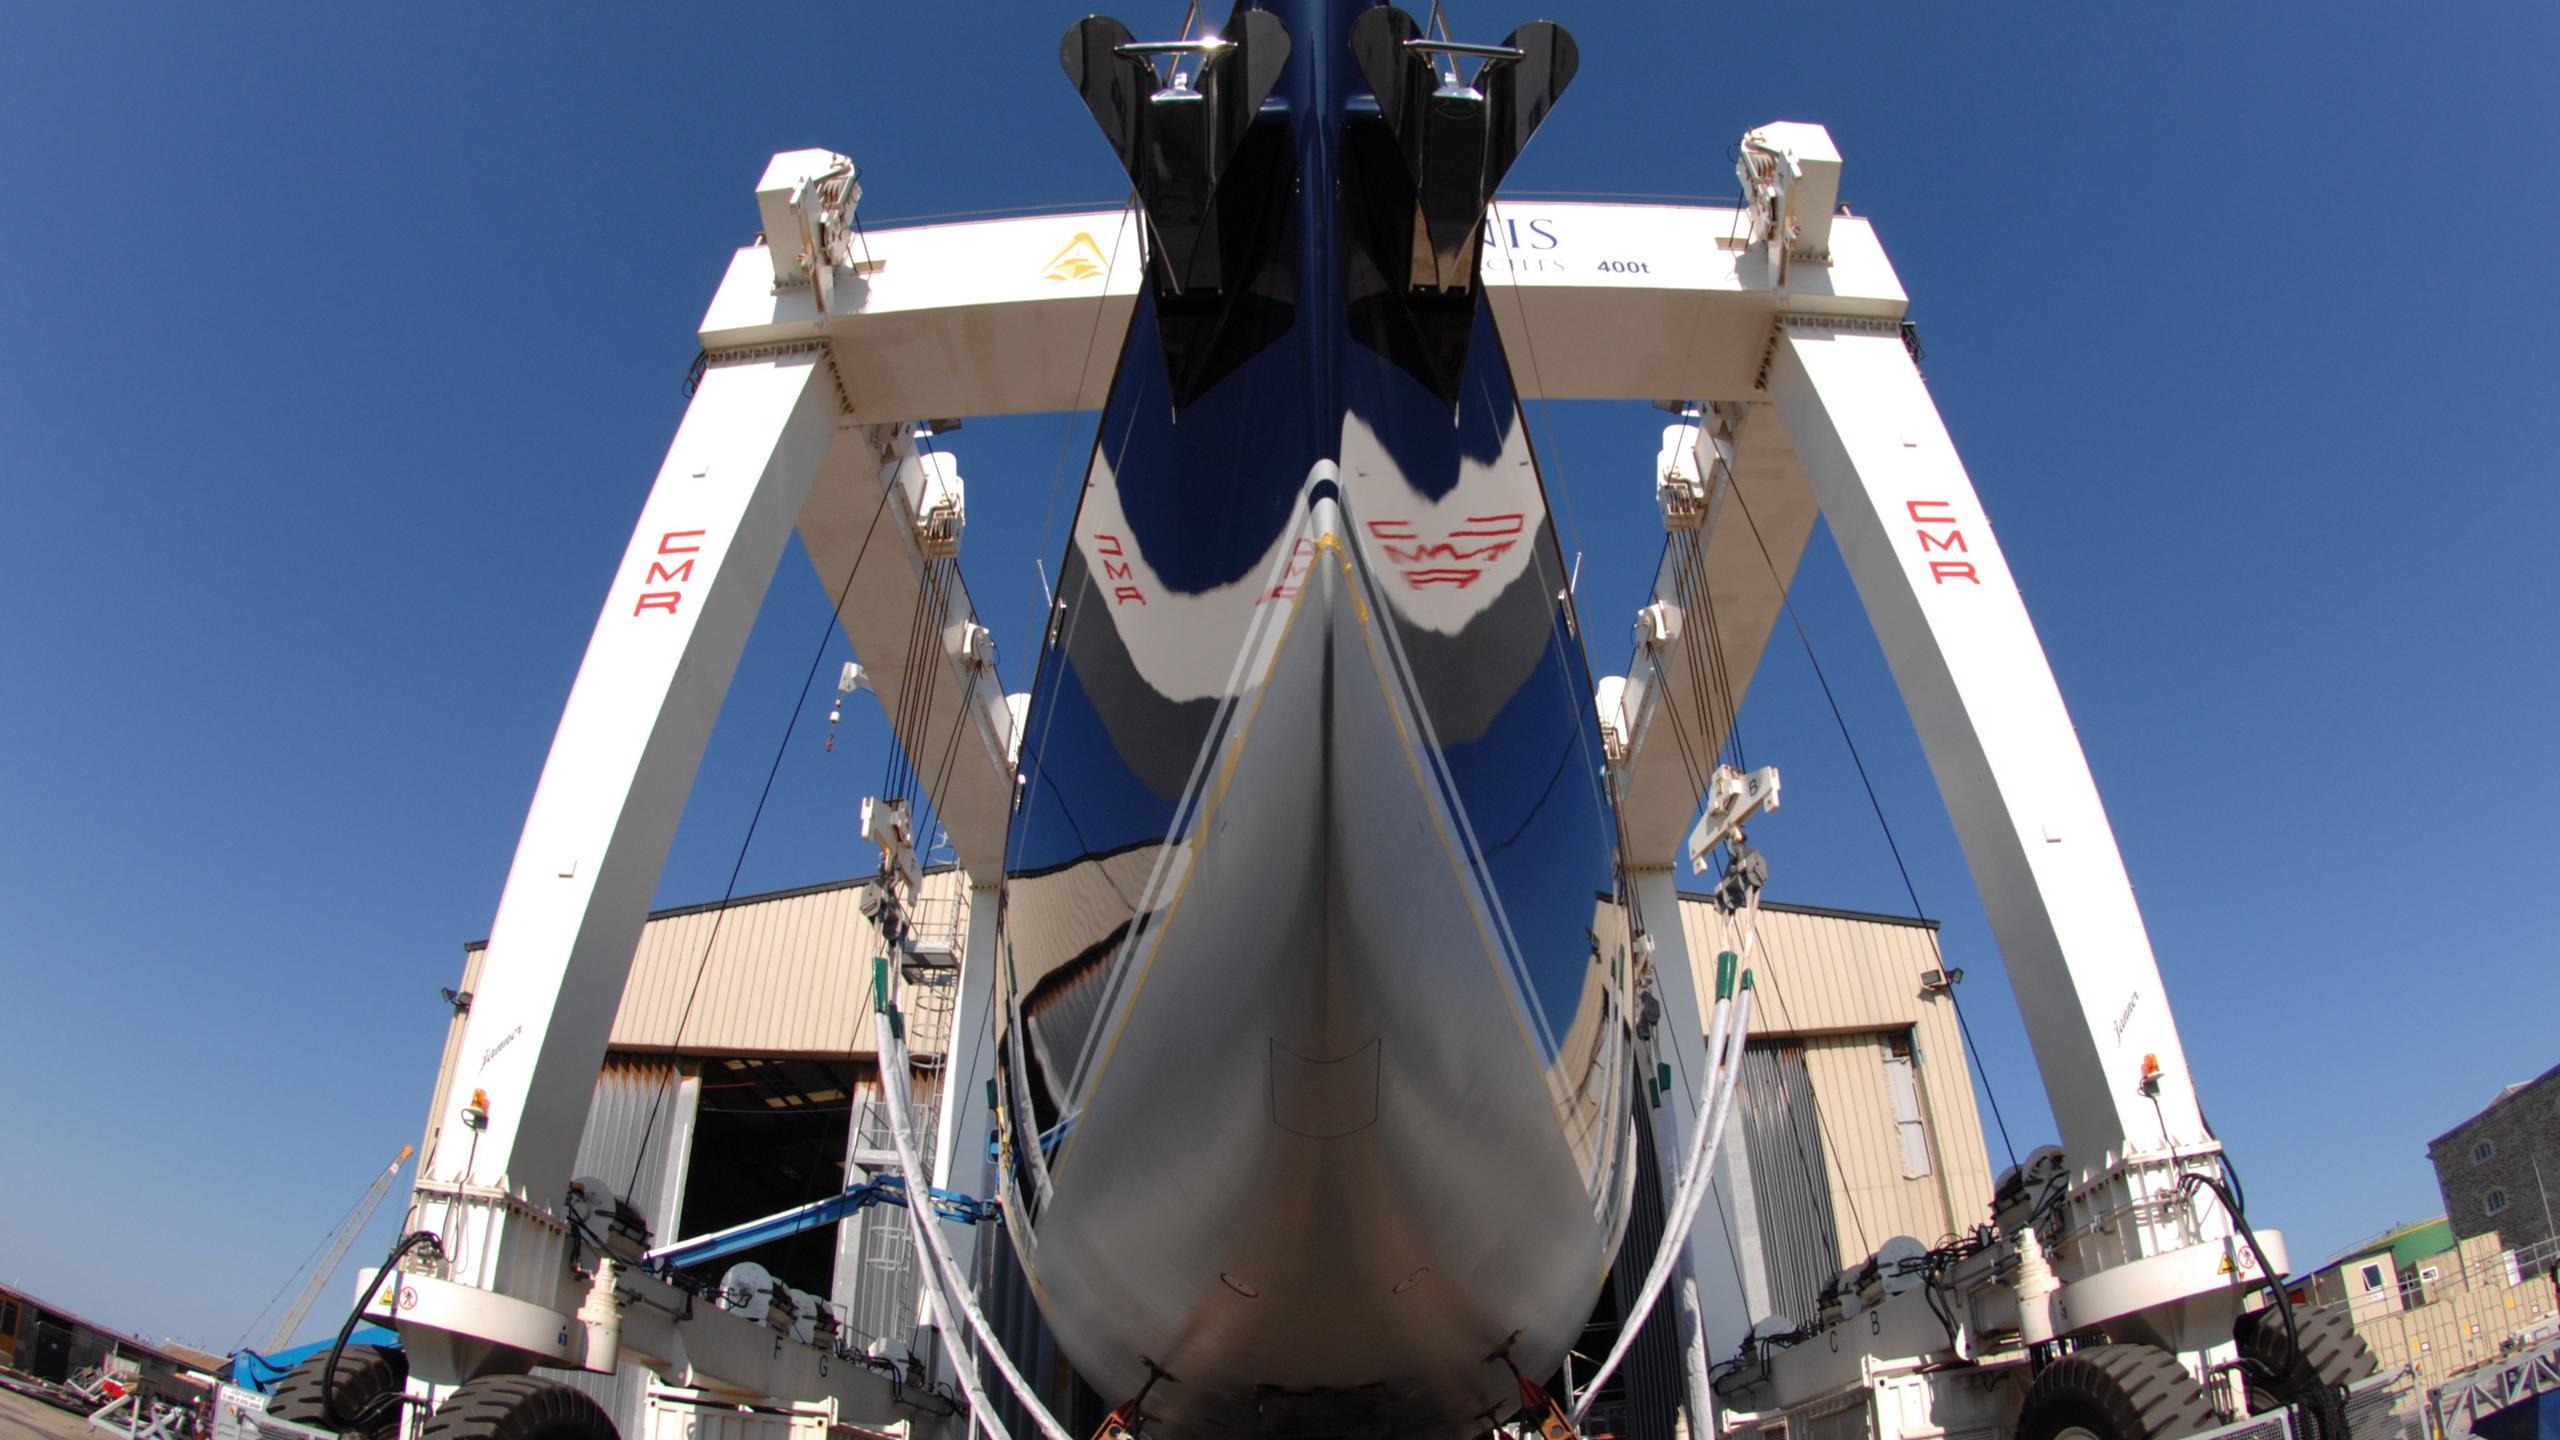 Nostromo sailing  at Pendennis shipyard